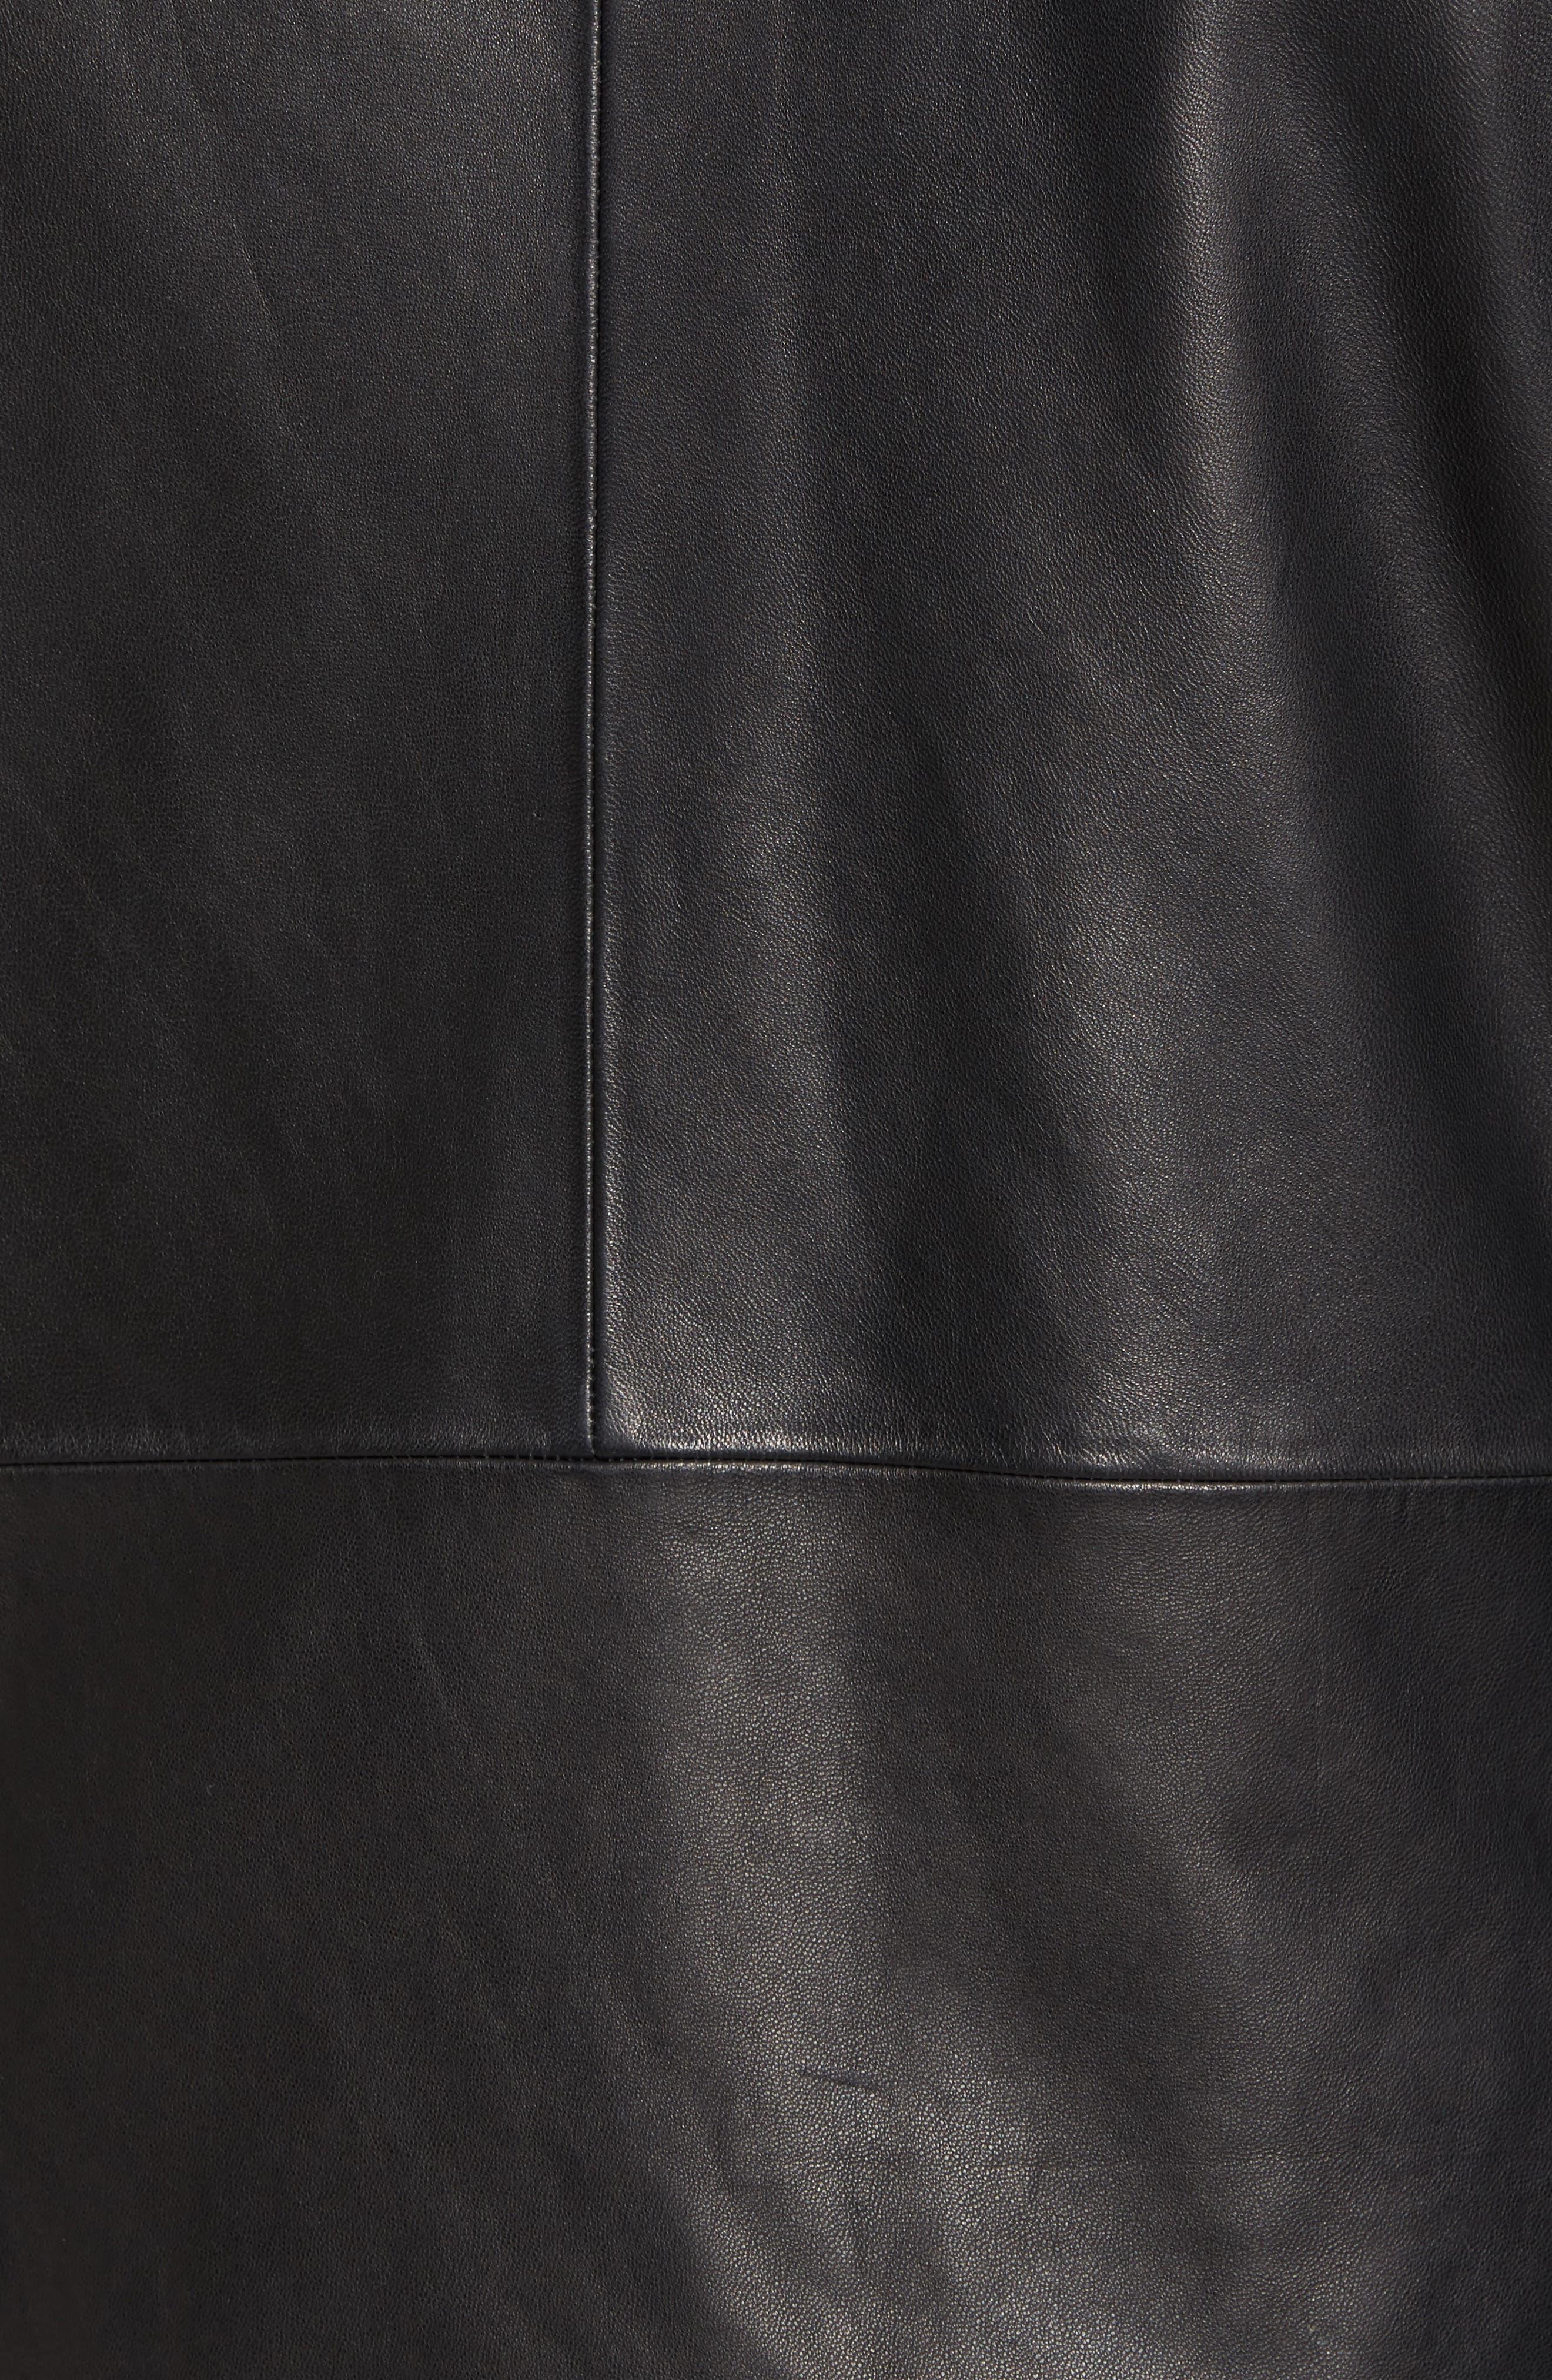 Hooded Leather Jacket,                             Alternate thumbnail 5, color,                             Black